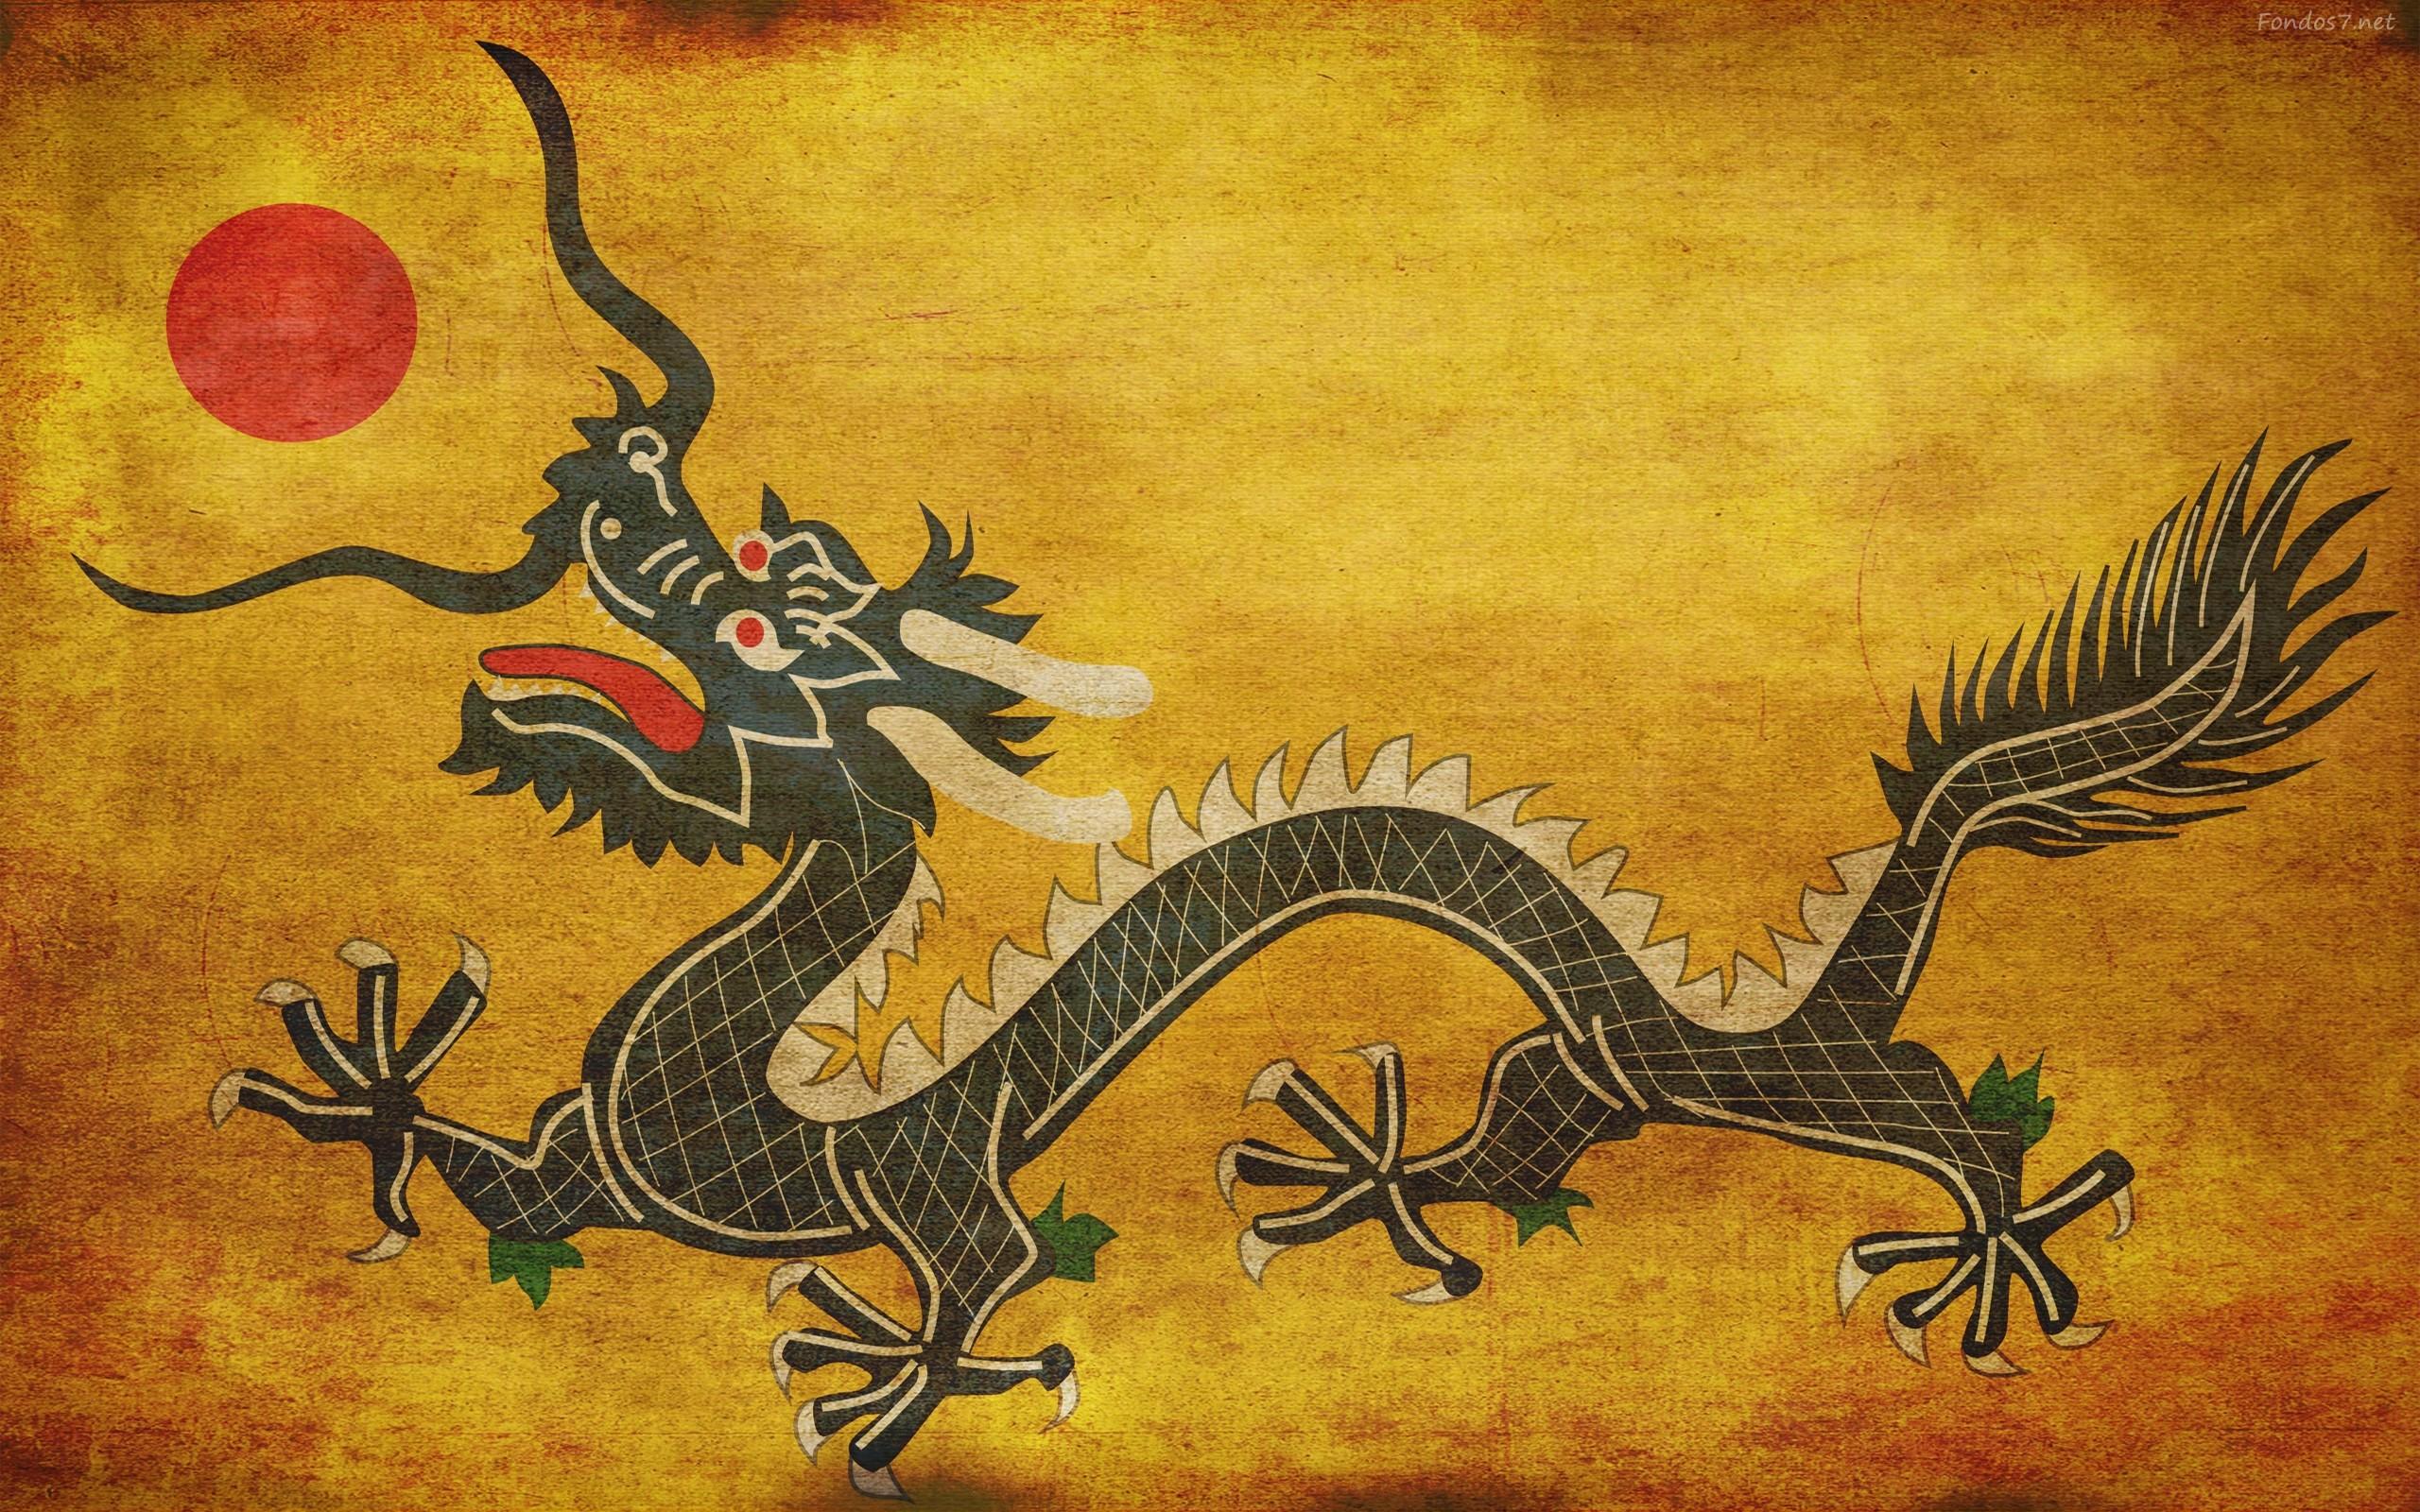 https://fondos7.net/wallpaper-original/wallpapers/Viejo-Dragon-Chino-Grunge-426.jpeg  | Dragons | Pinterest | Dragon fight, Dragons and Wallpaper